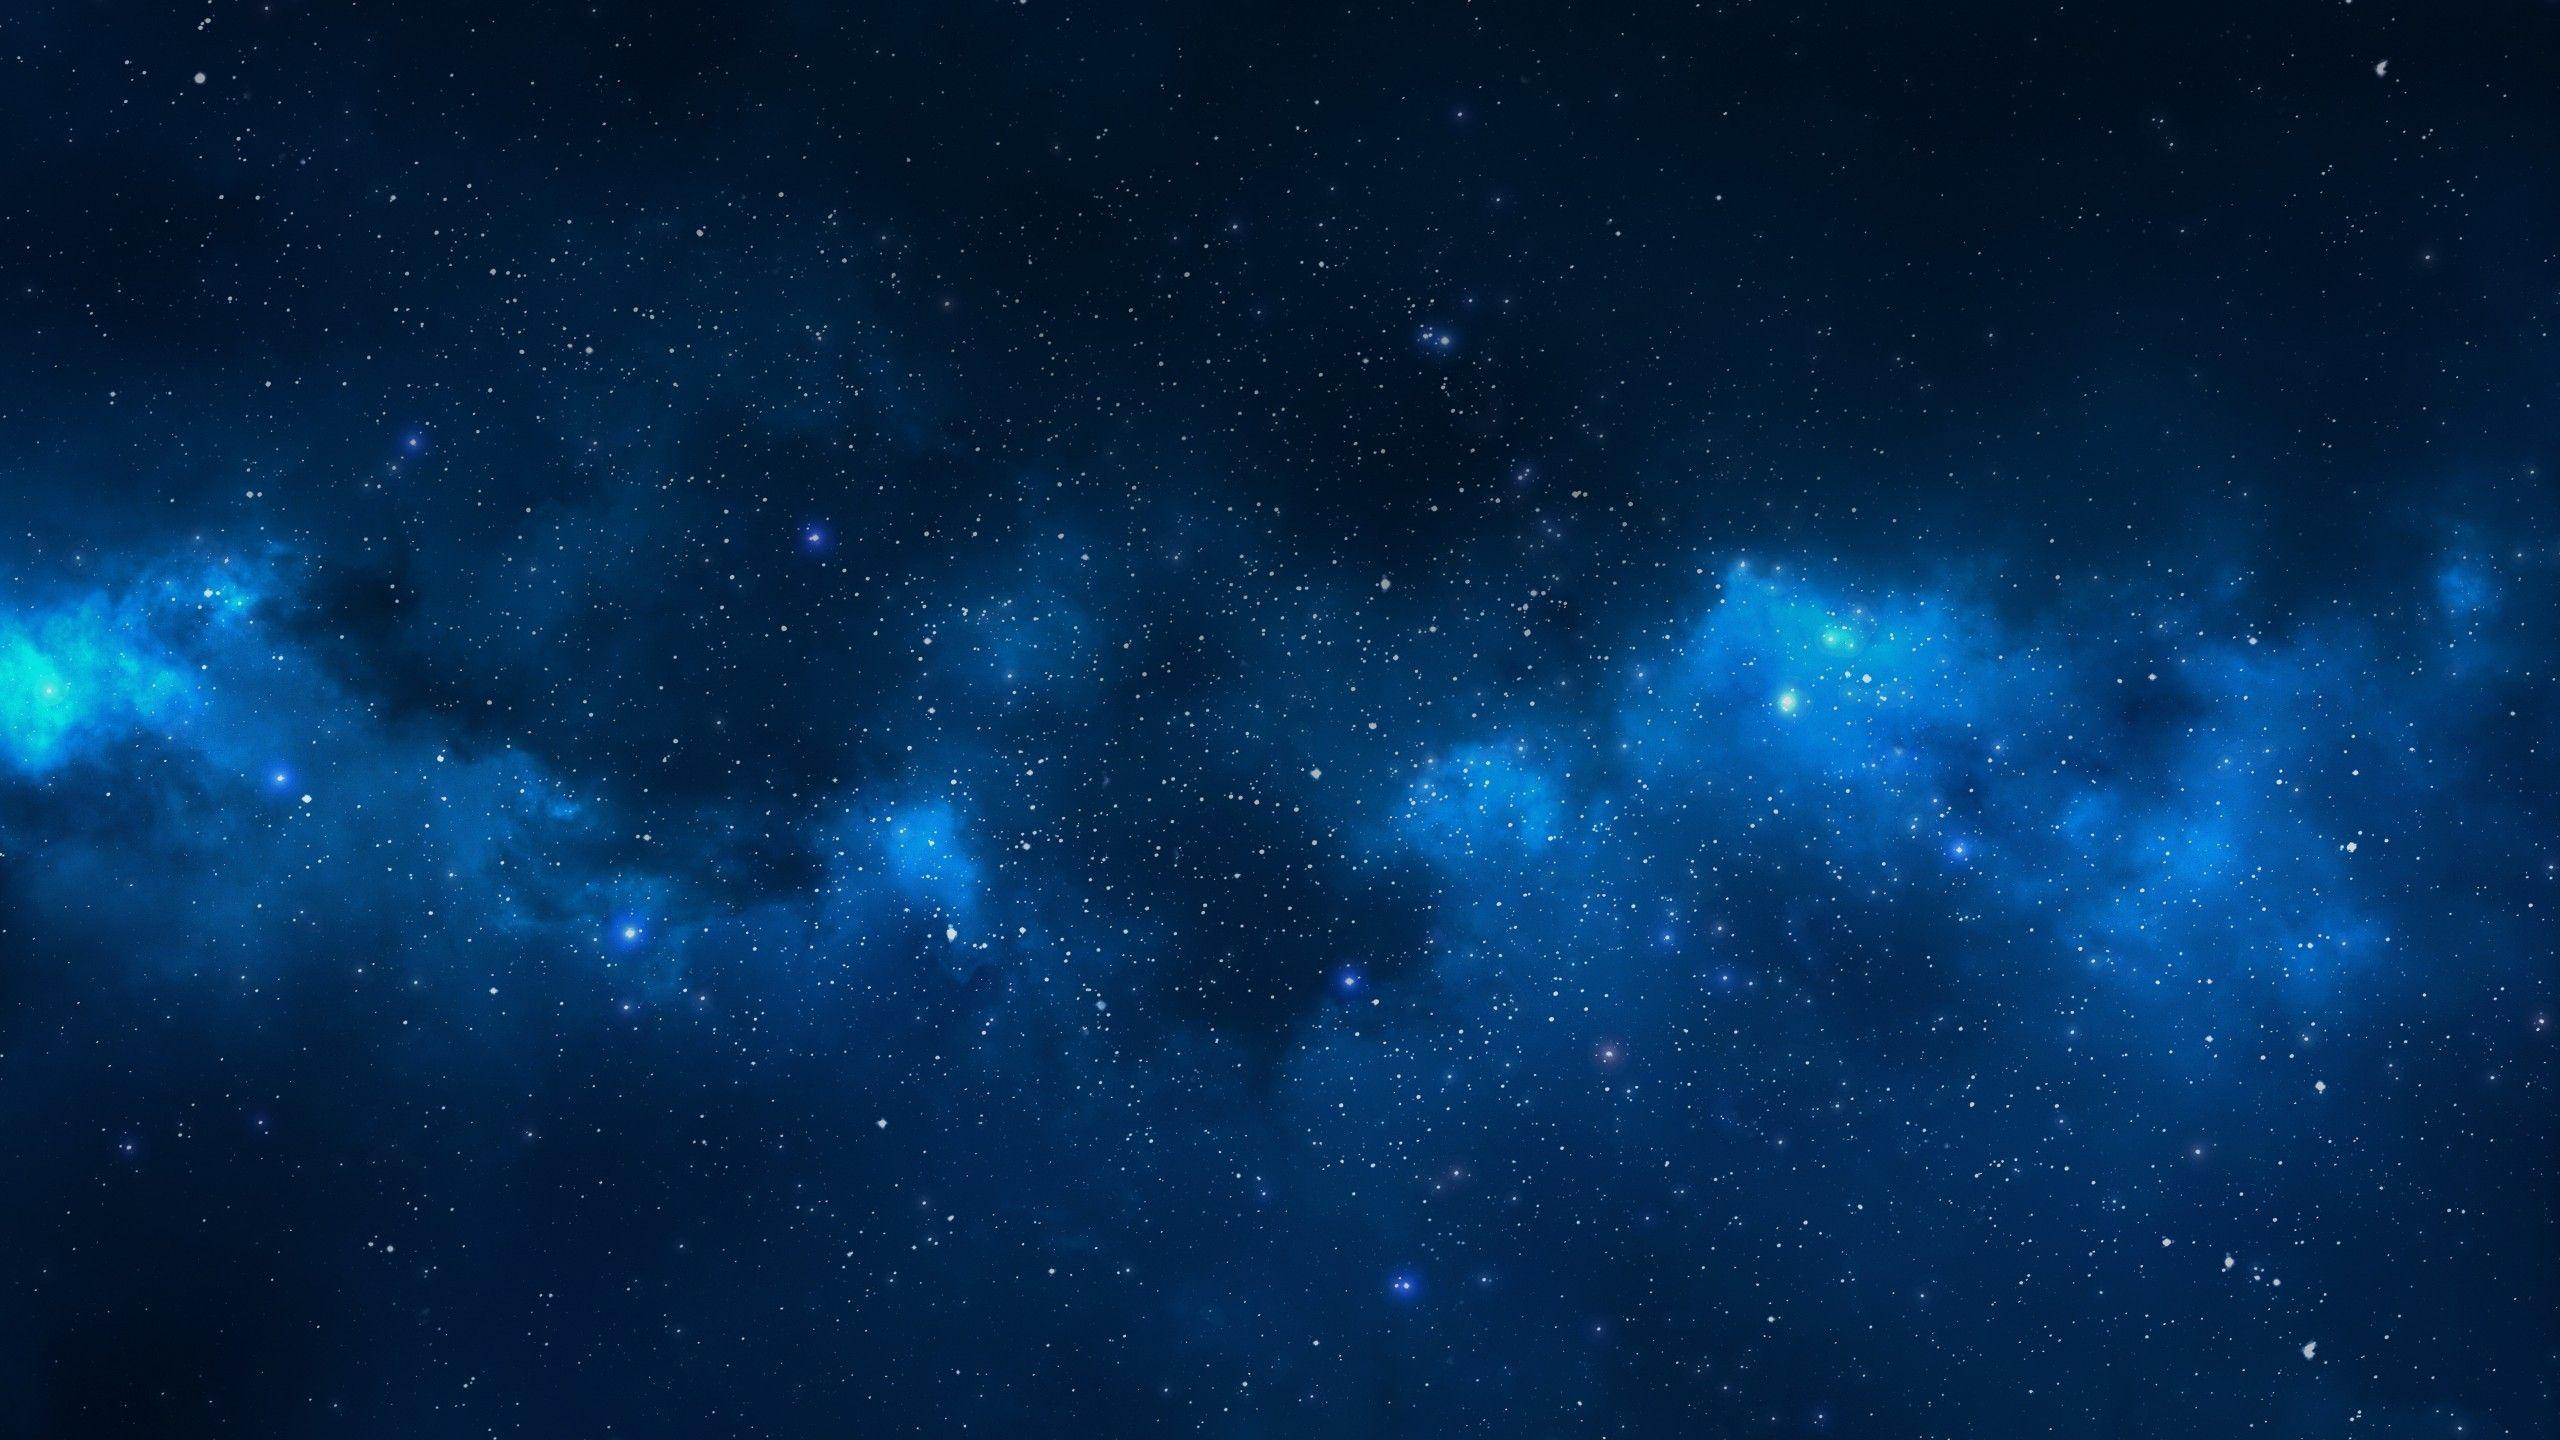 Stars Galaxies Wallpaper Papel De Parede Computador Ceu Estrelado Papel De Parede Do Notebook